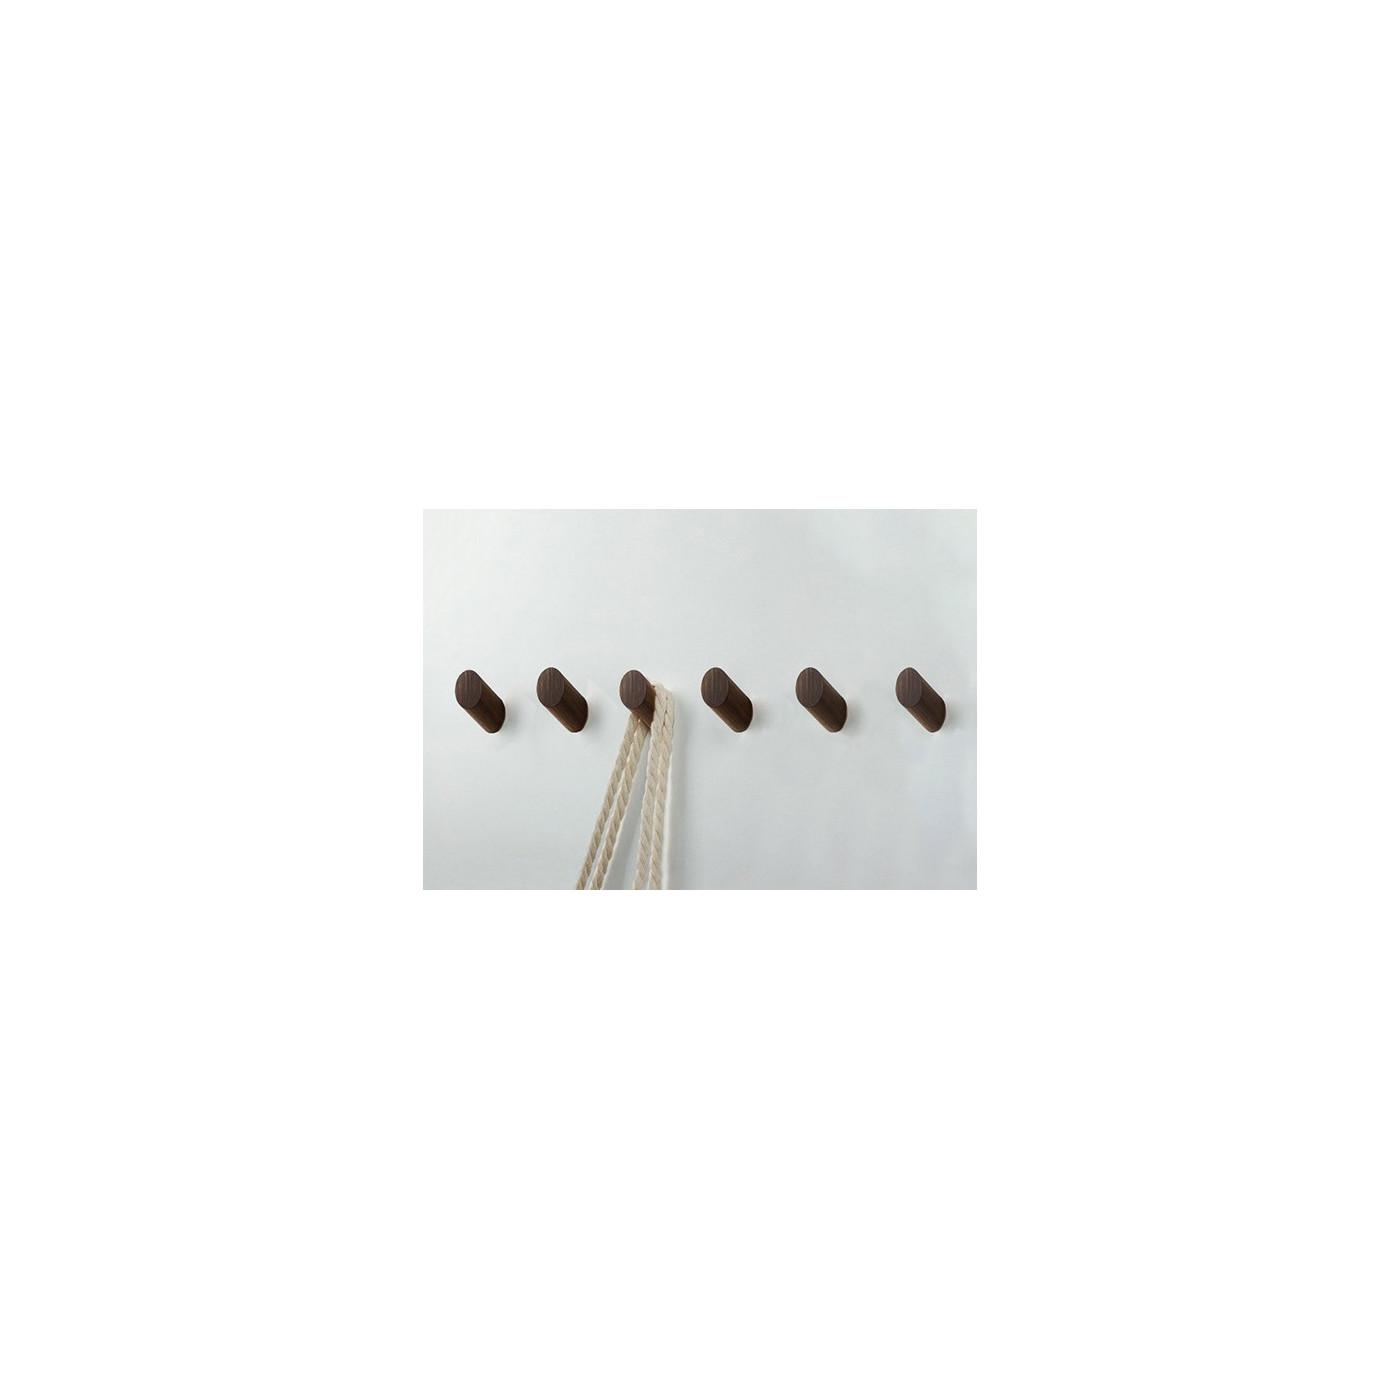 Set of 6 wooden clothes hooks, walnut wood